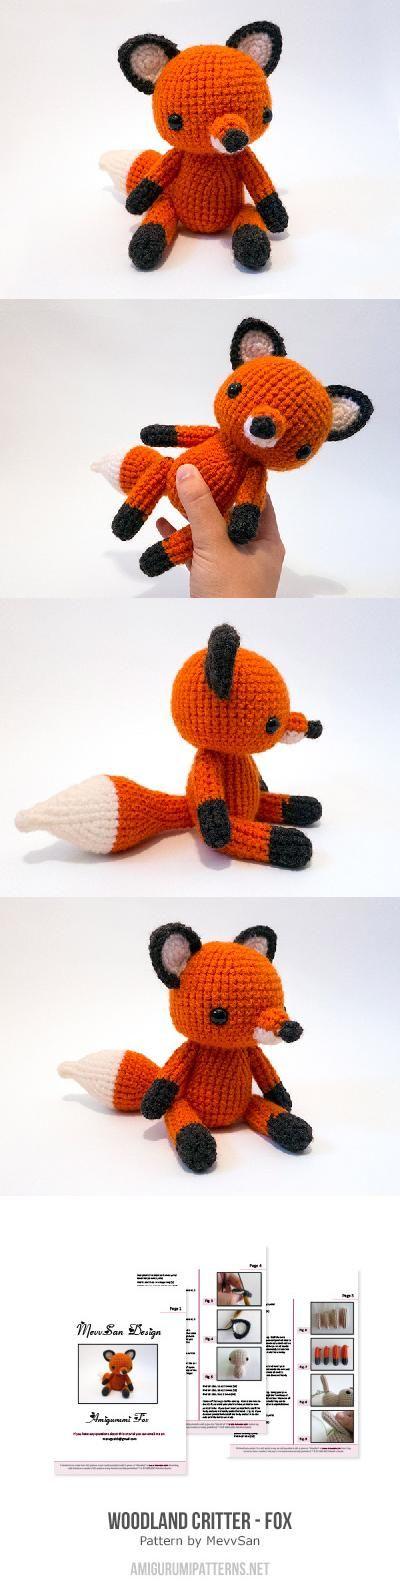 Woodland Critter - Fox Amigurumi Pattern